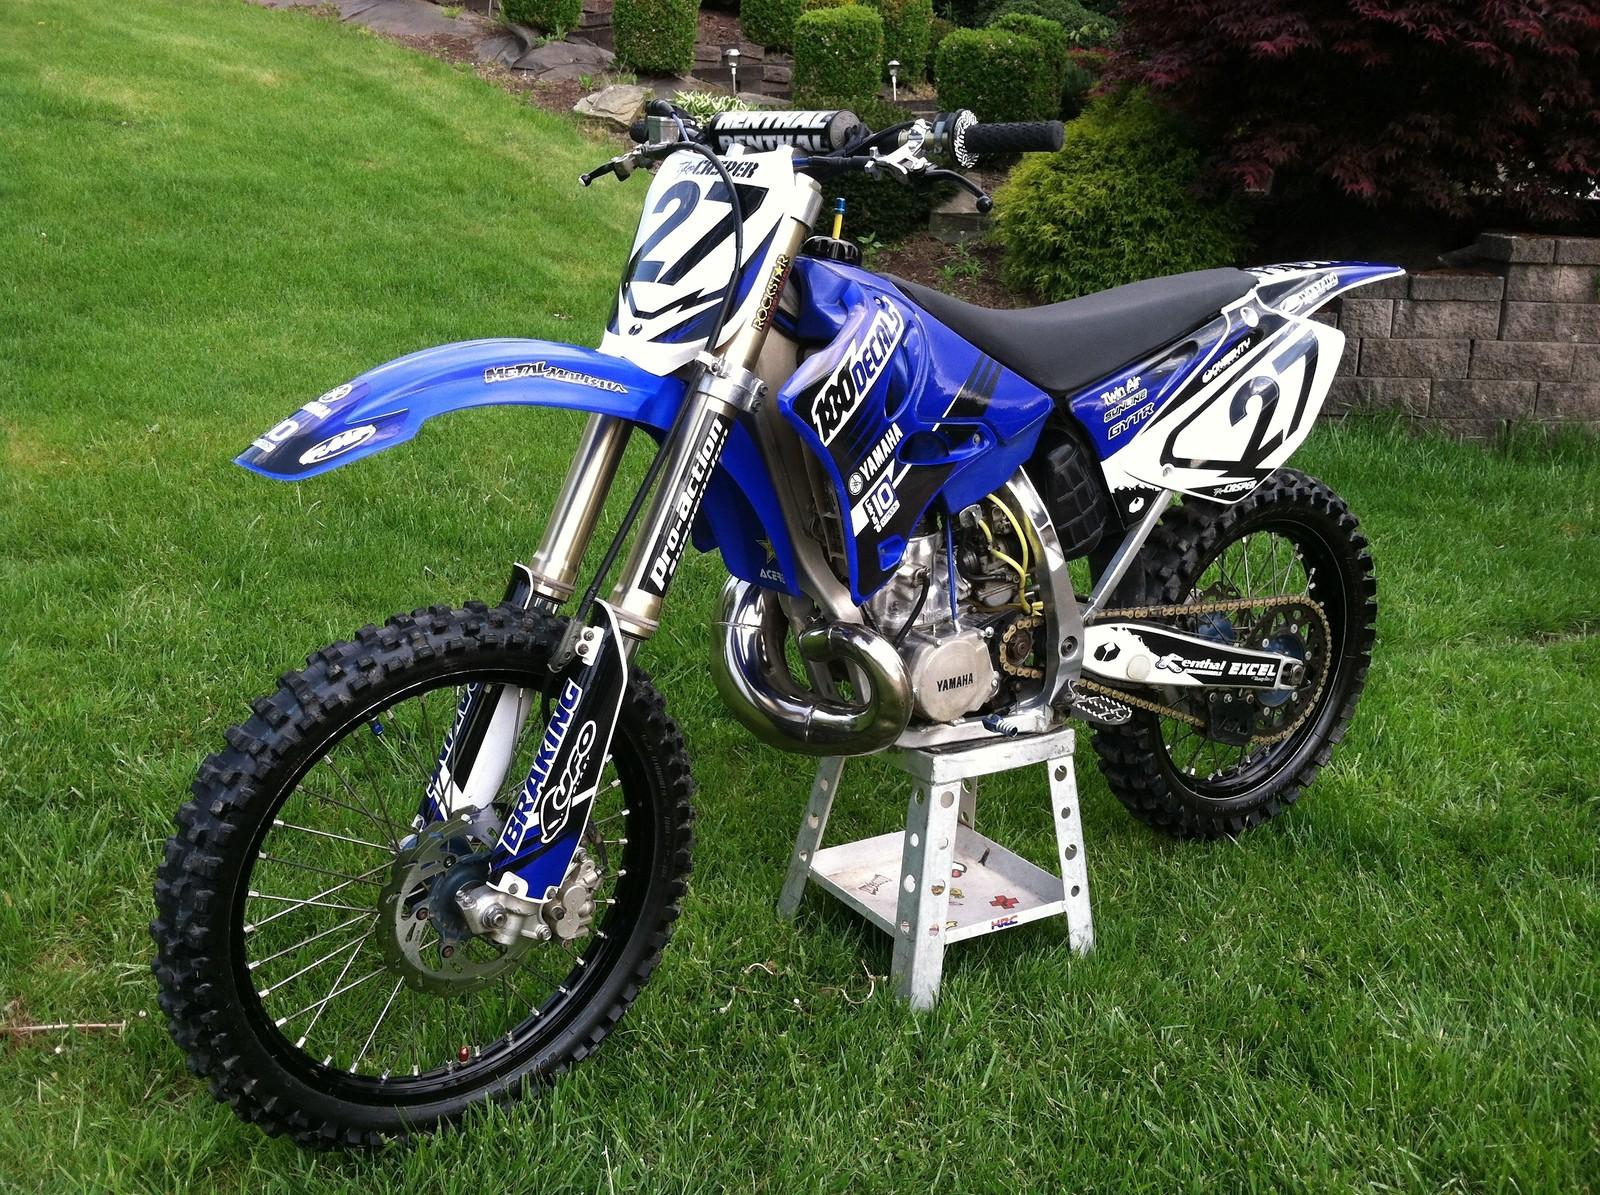 2005 yz 250 2 stroke tyler casper 27 39 s bike check